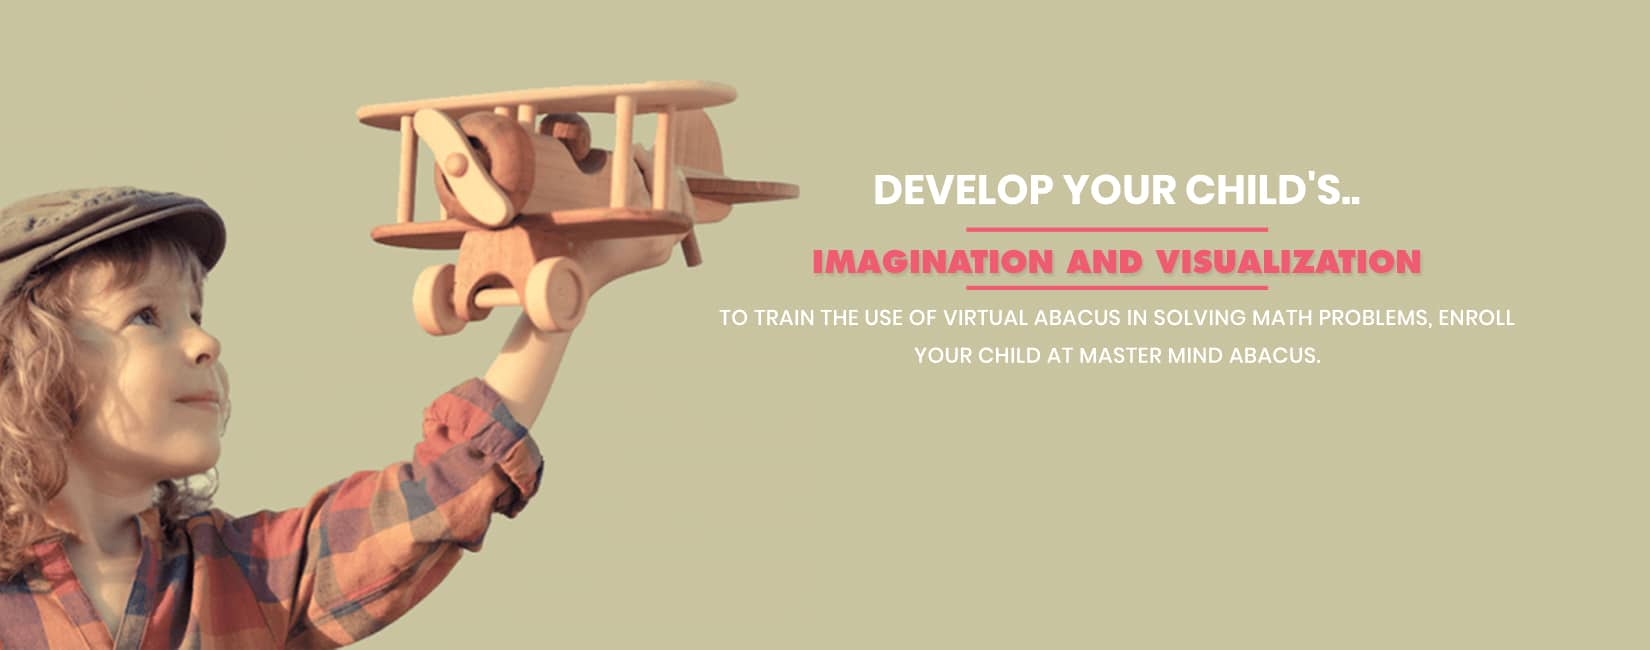 Mastermind-Imagination-and-Visualization